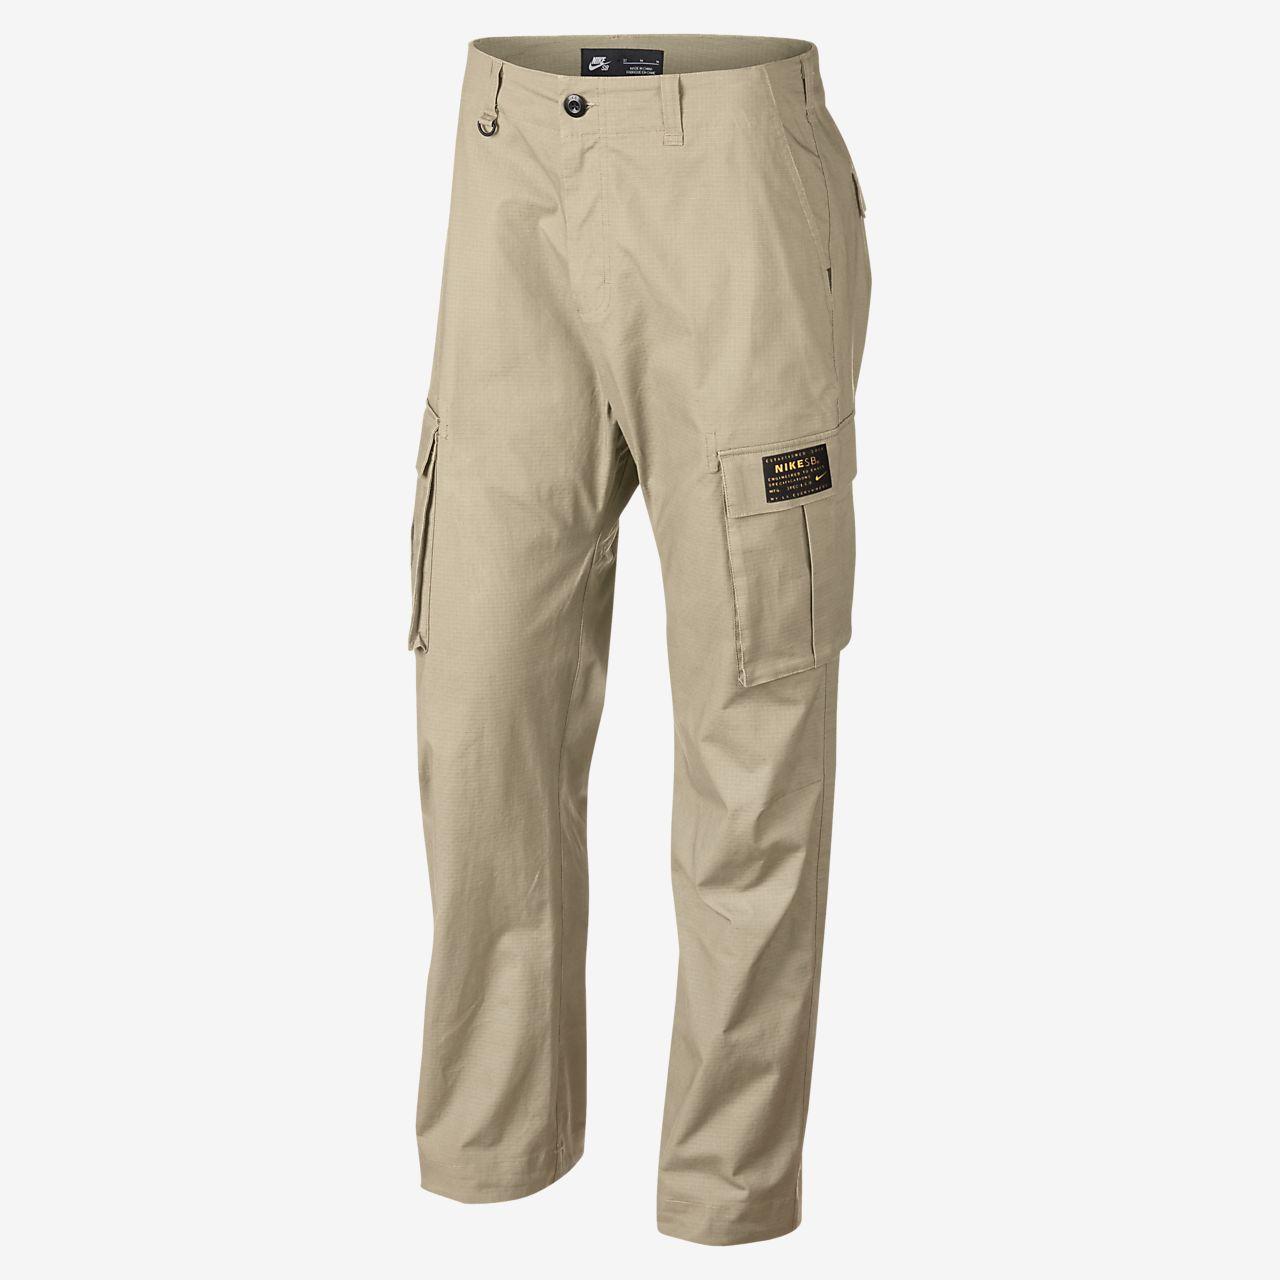 Pantalon cargo de skateboard Nike SB Flex FTM pour Homme